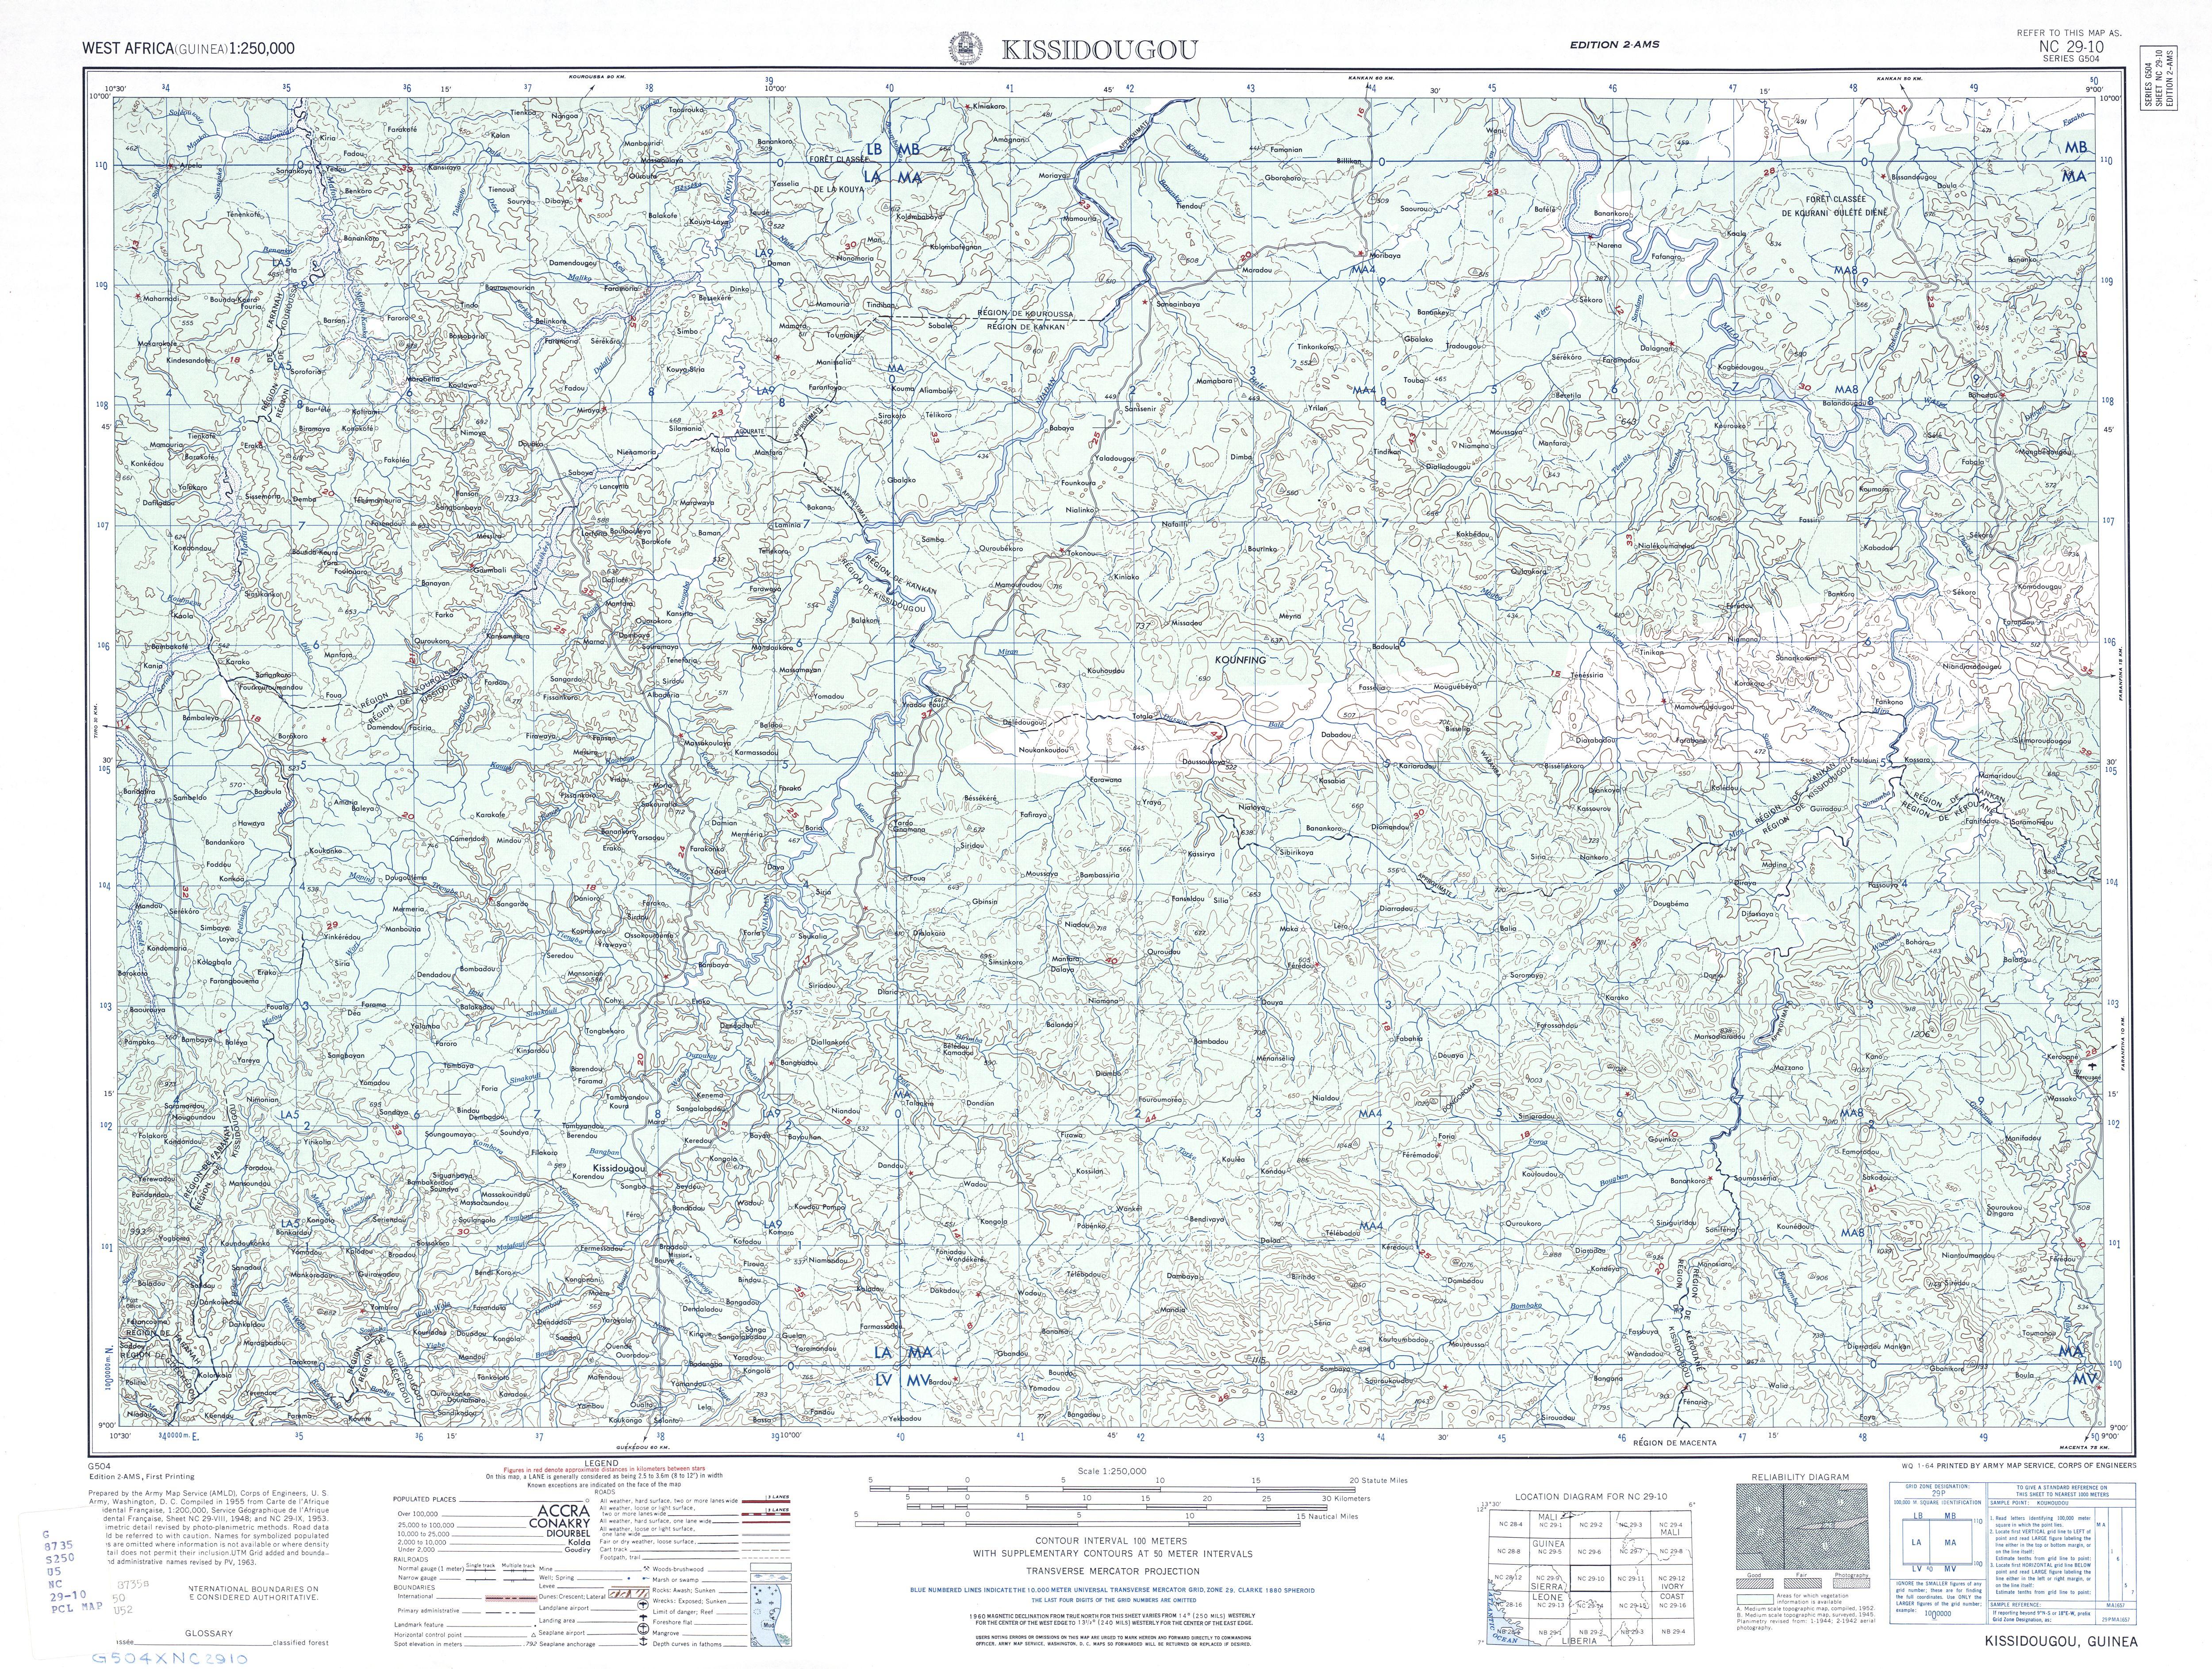 Hoja Kissidougou del Mapa Topográfico de África Occidental 1955